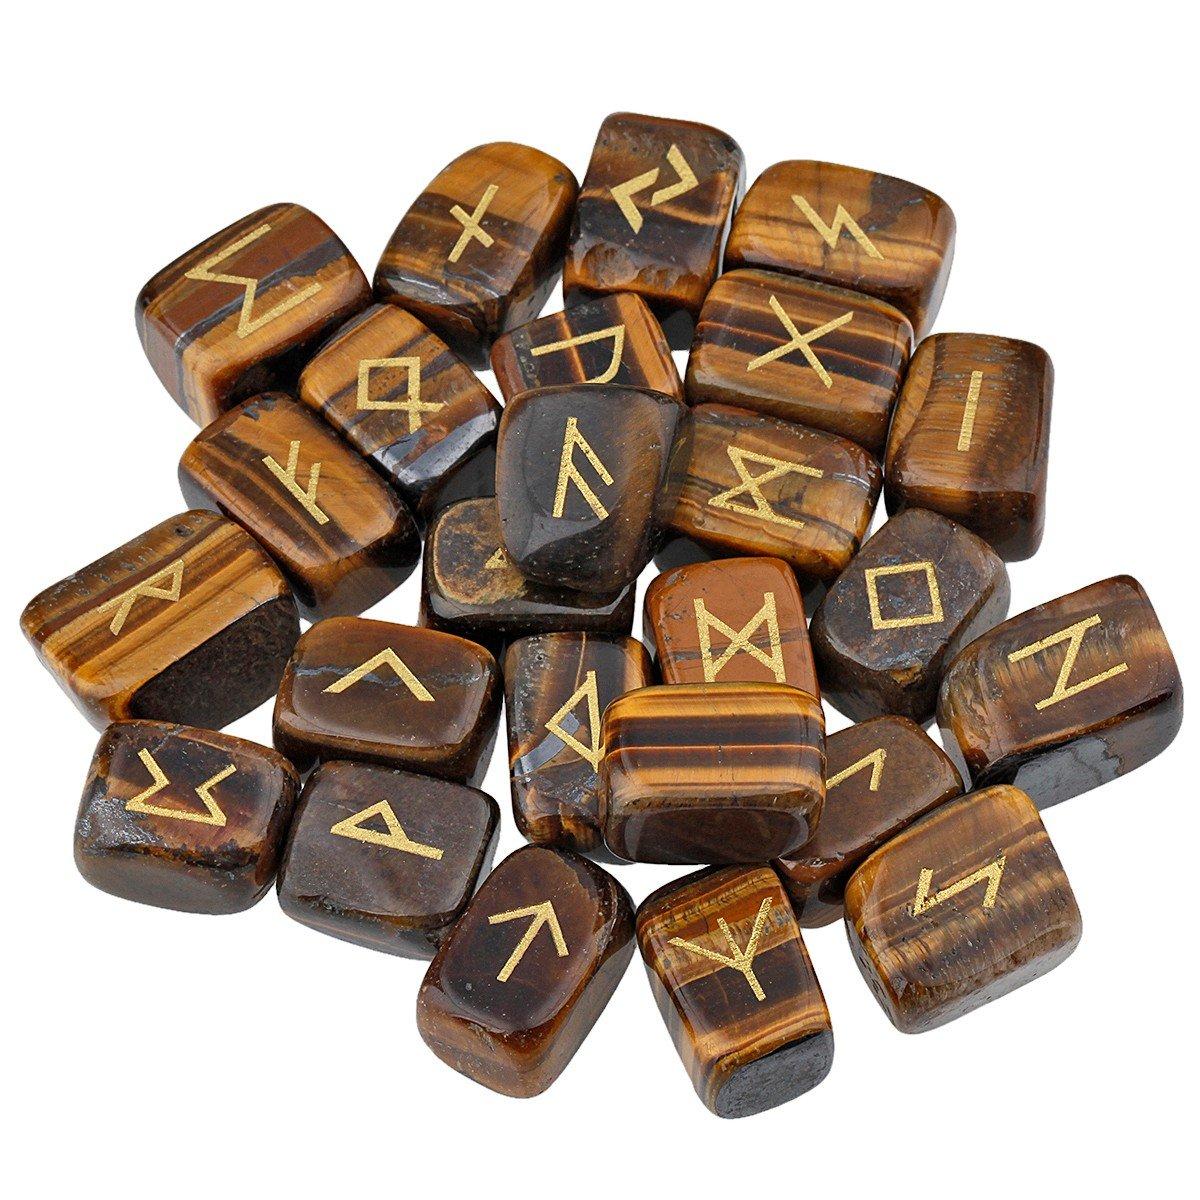 mookaitedecor Rune Stones Set with Engraved Elder Futhark Alphabet Crystal Meditation Divination,Hematite GDSTSU000505